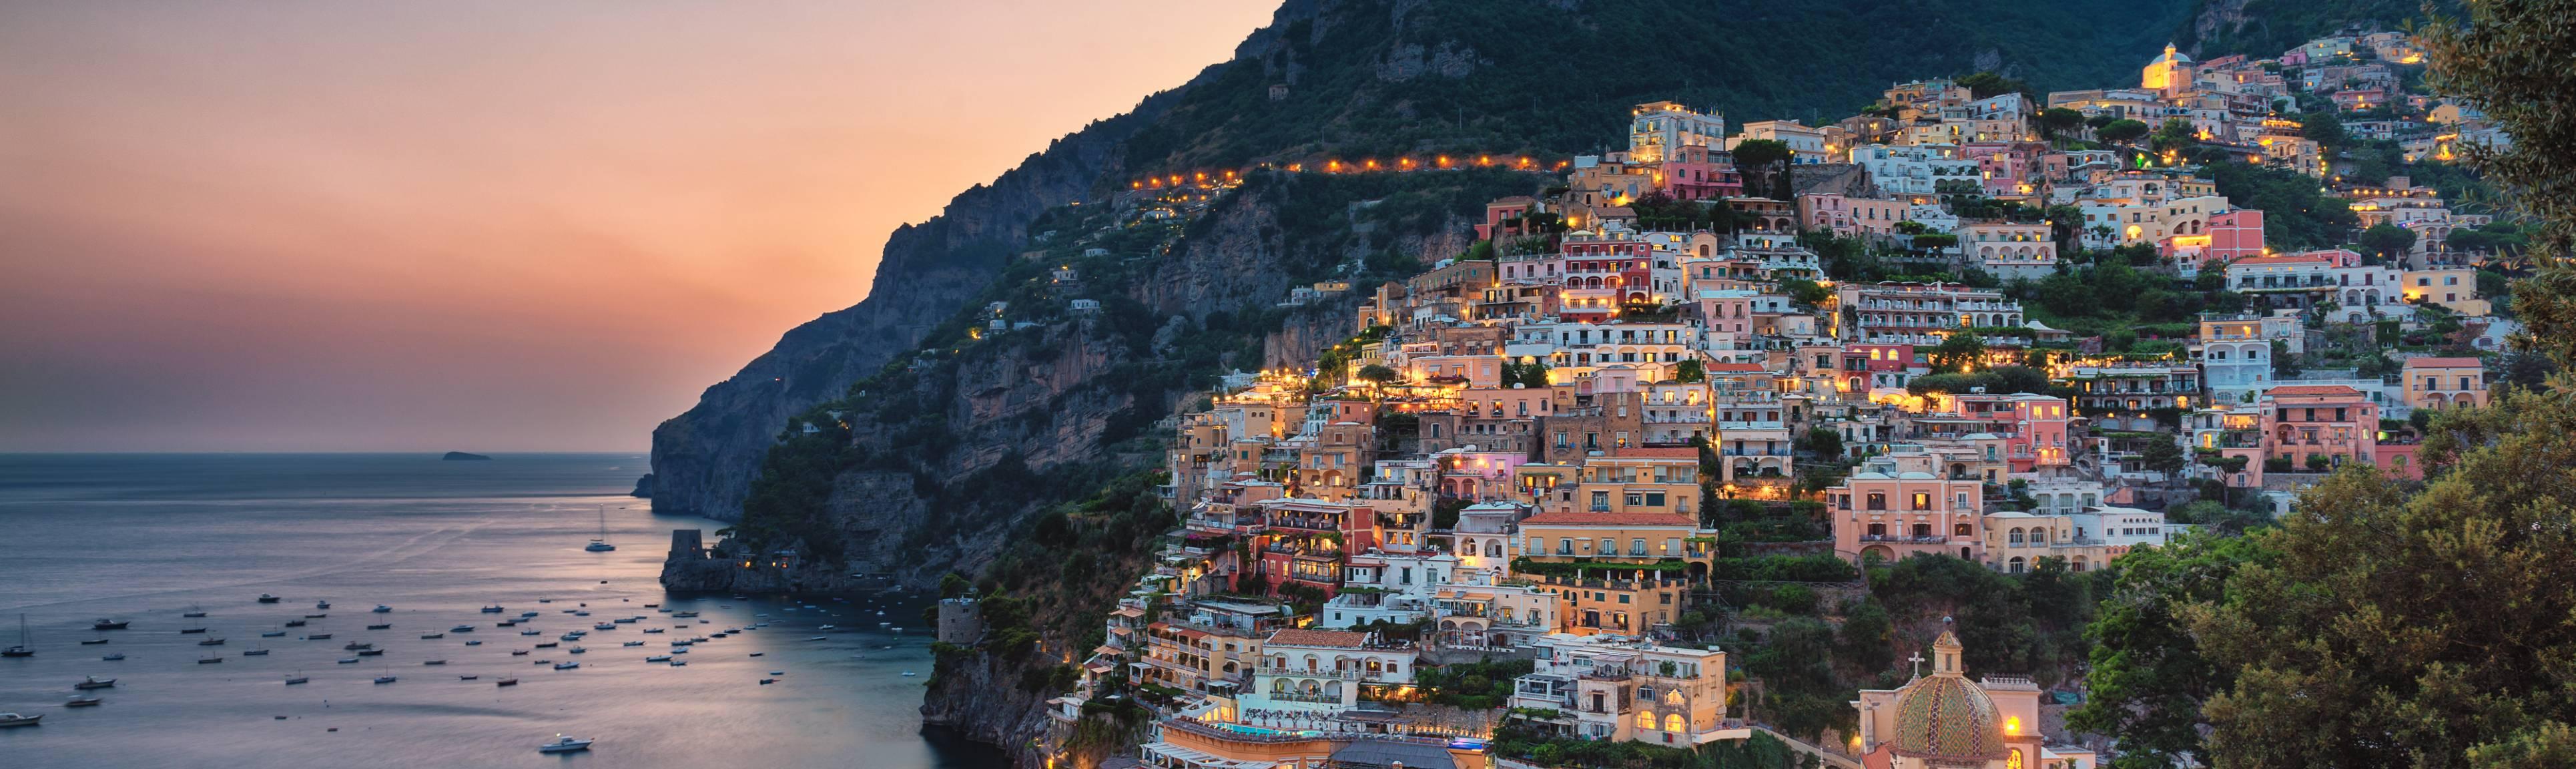 Sunset view of city of Positano on the Amalfi Coast